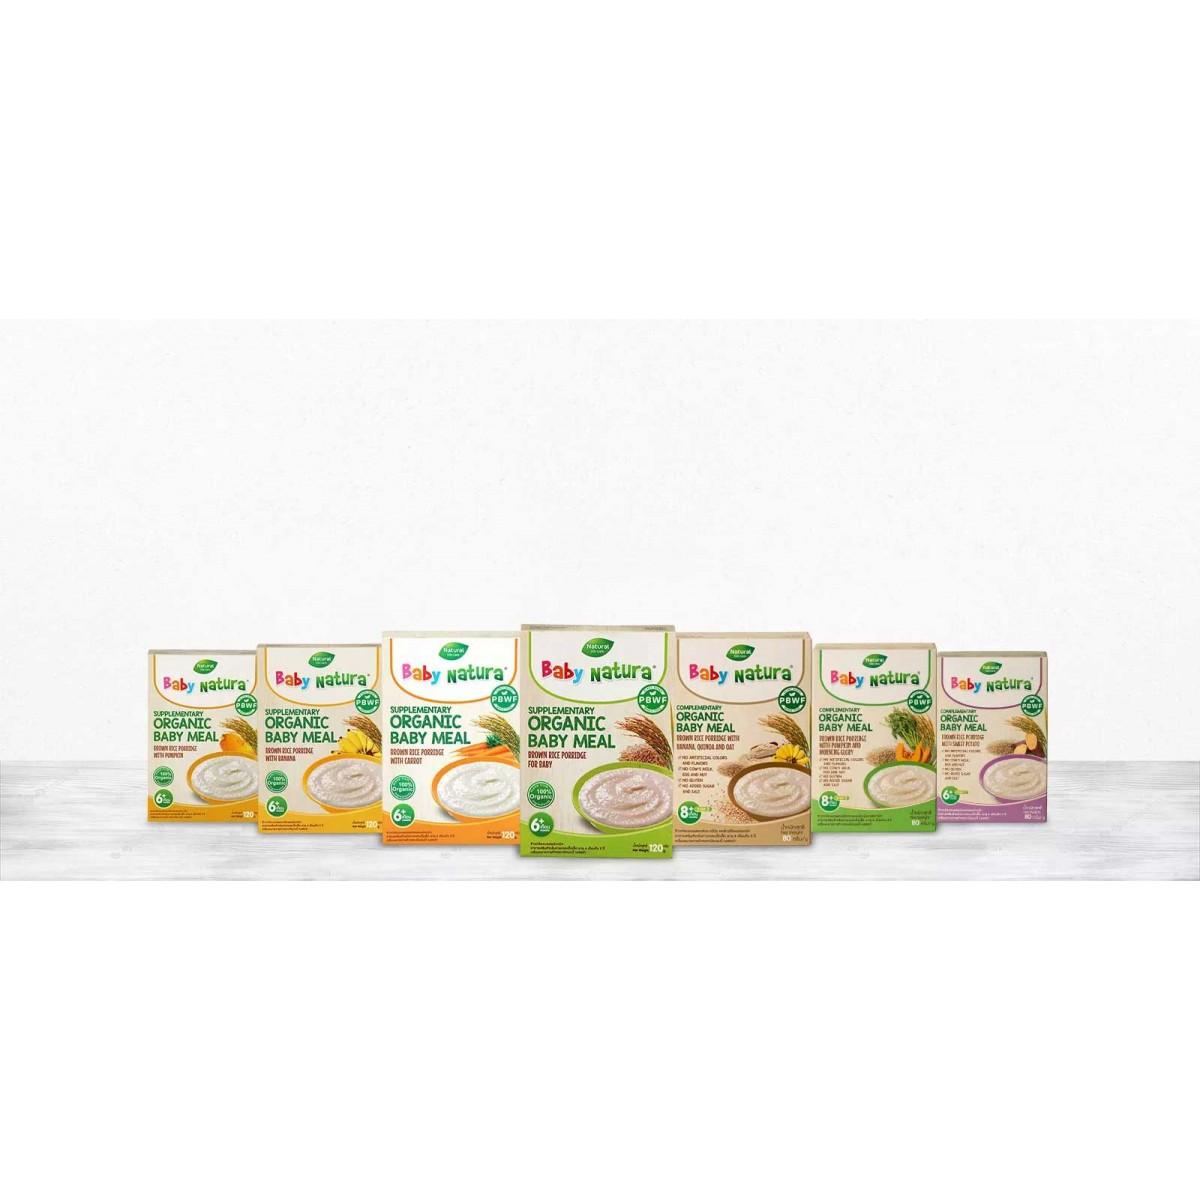 Baby Natura Brown Rice Porridge Sweet Potato  Pumpkin Morning Glory Quinoa - 5 Sachet - Best for Travel - Halal